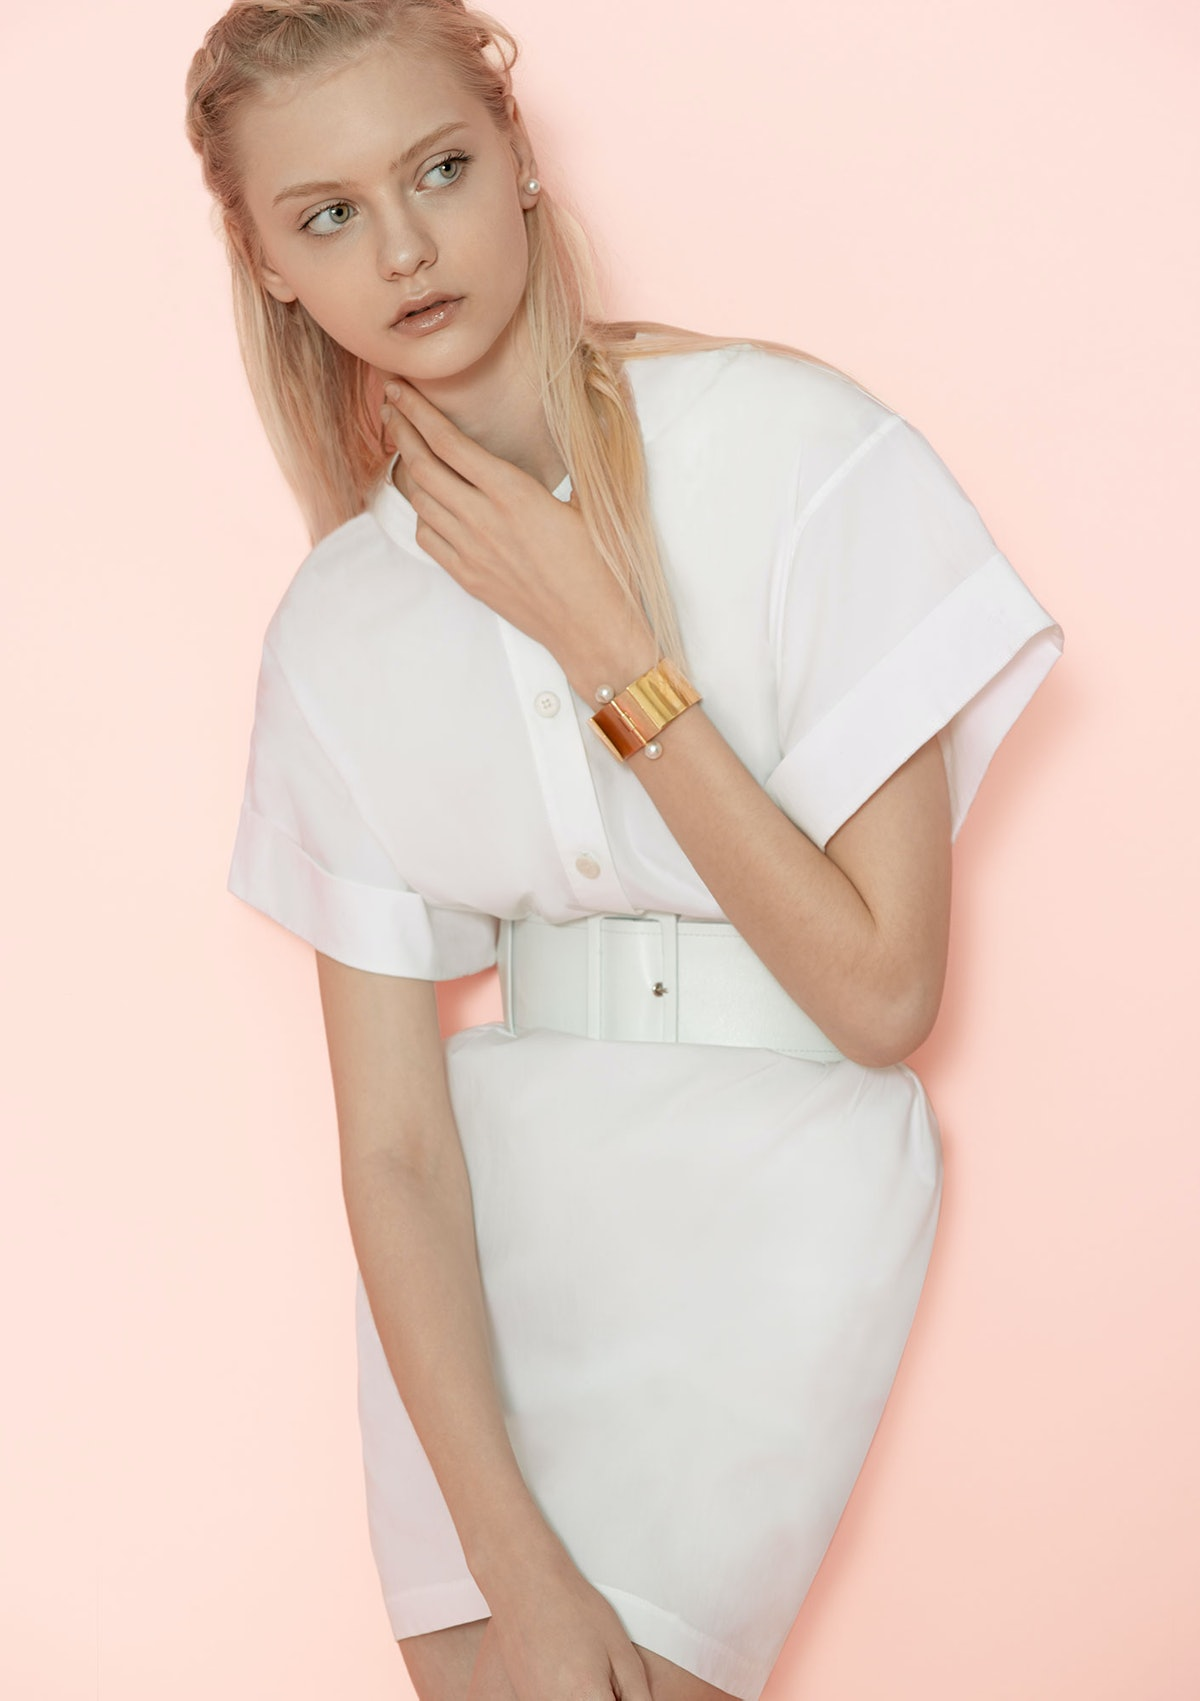 Striped Shirtdress Trend